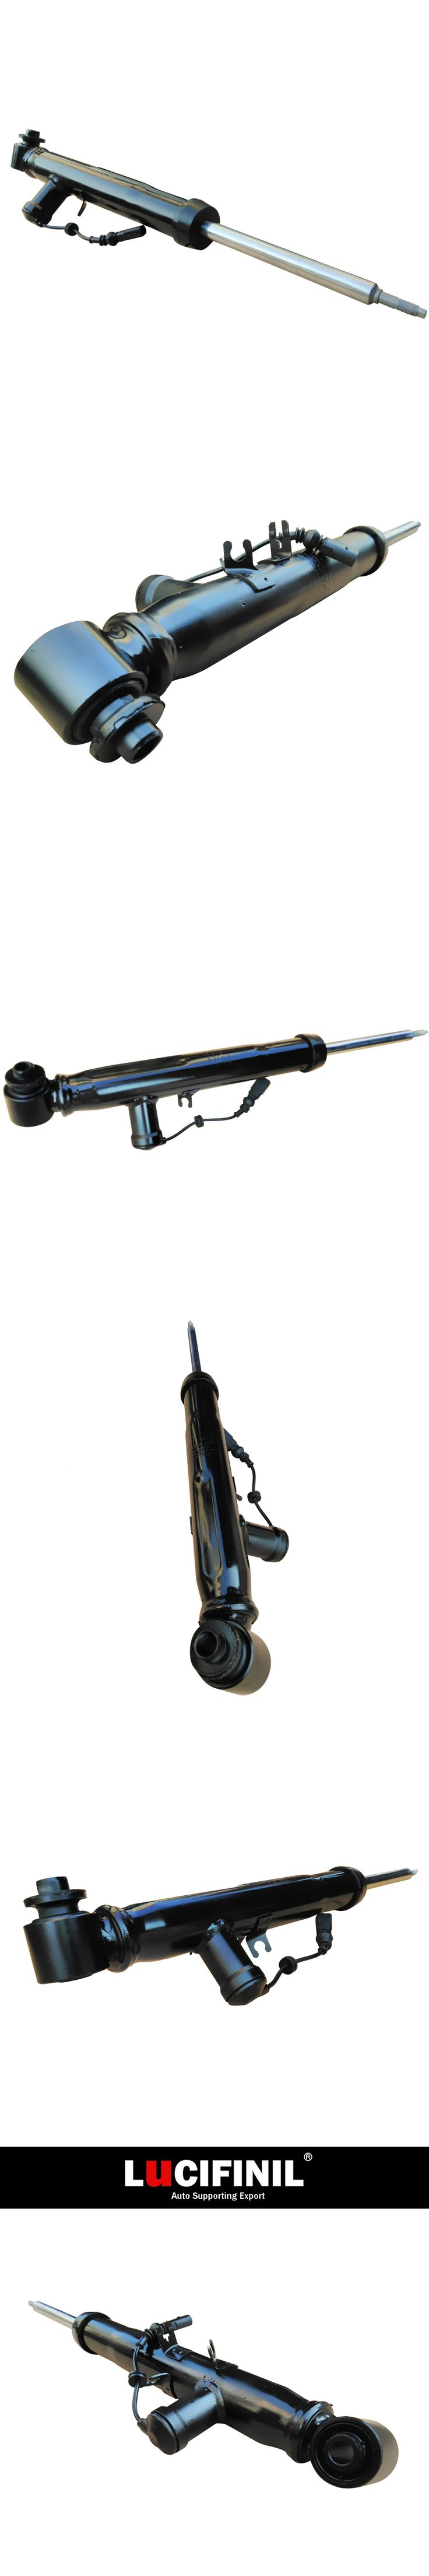 A6 C6 Quattro Rear Right With Sensor ADS Damper Shock Absorber Air Springs Air Shocks Air Suspension 4F0616032M  F0616032K